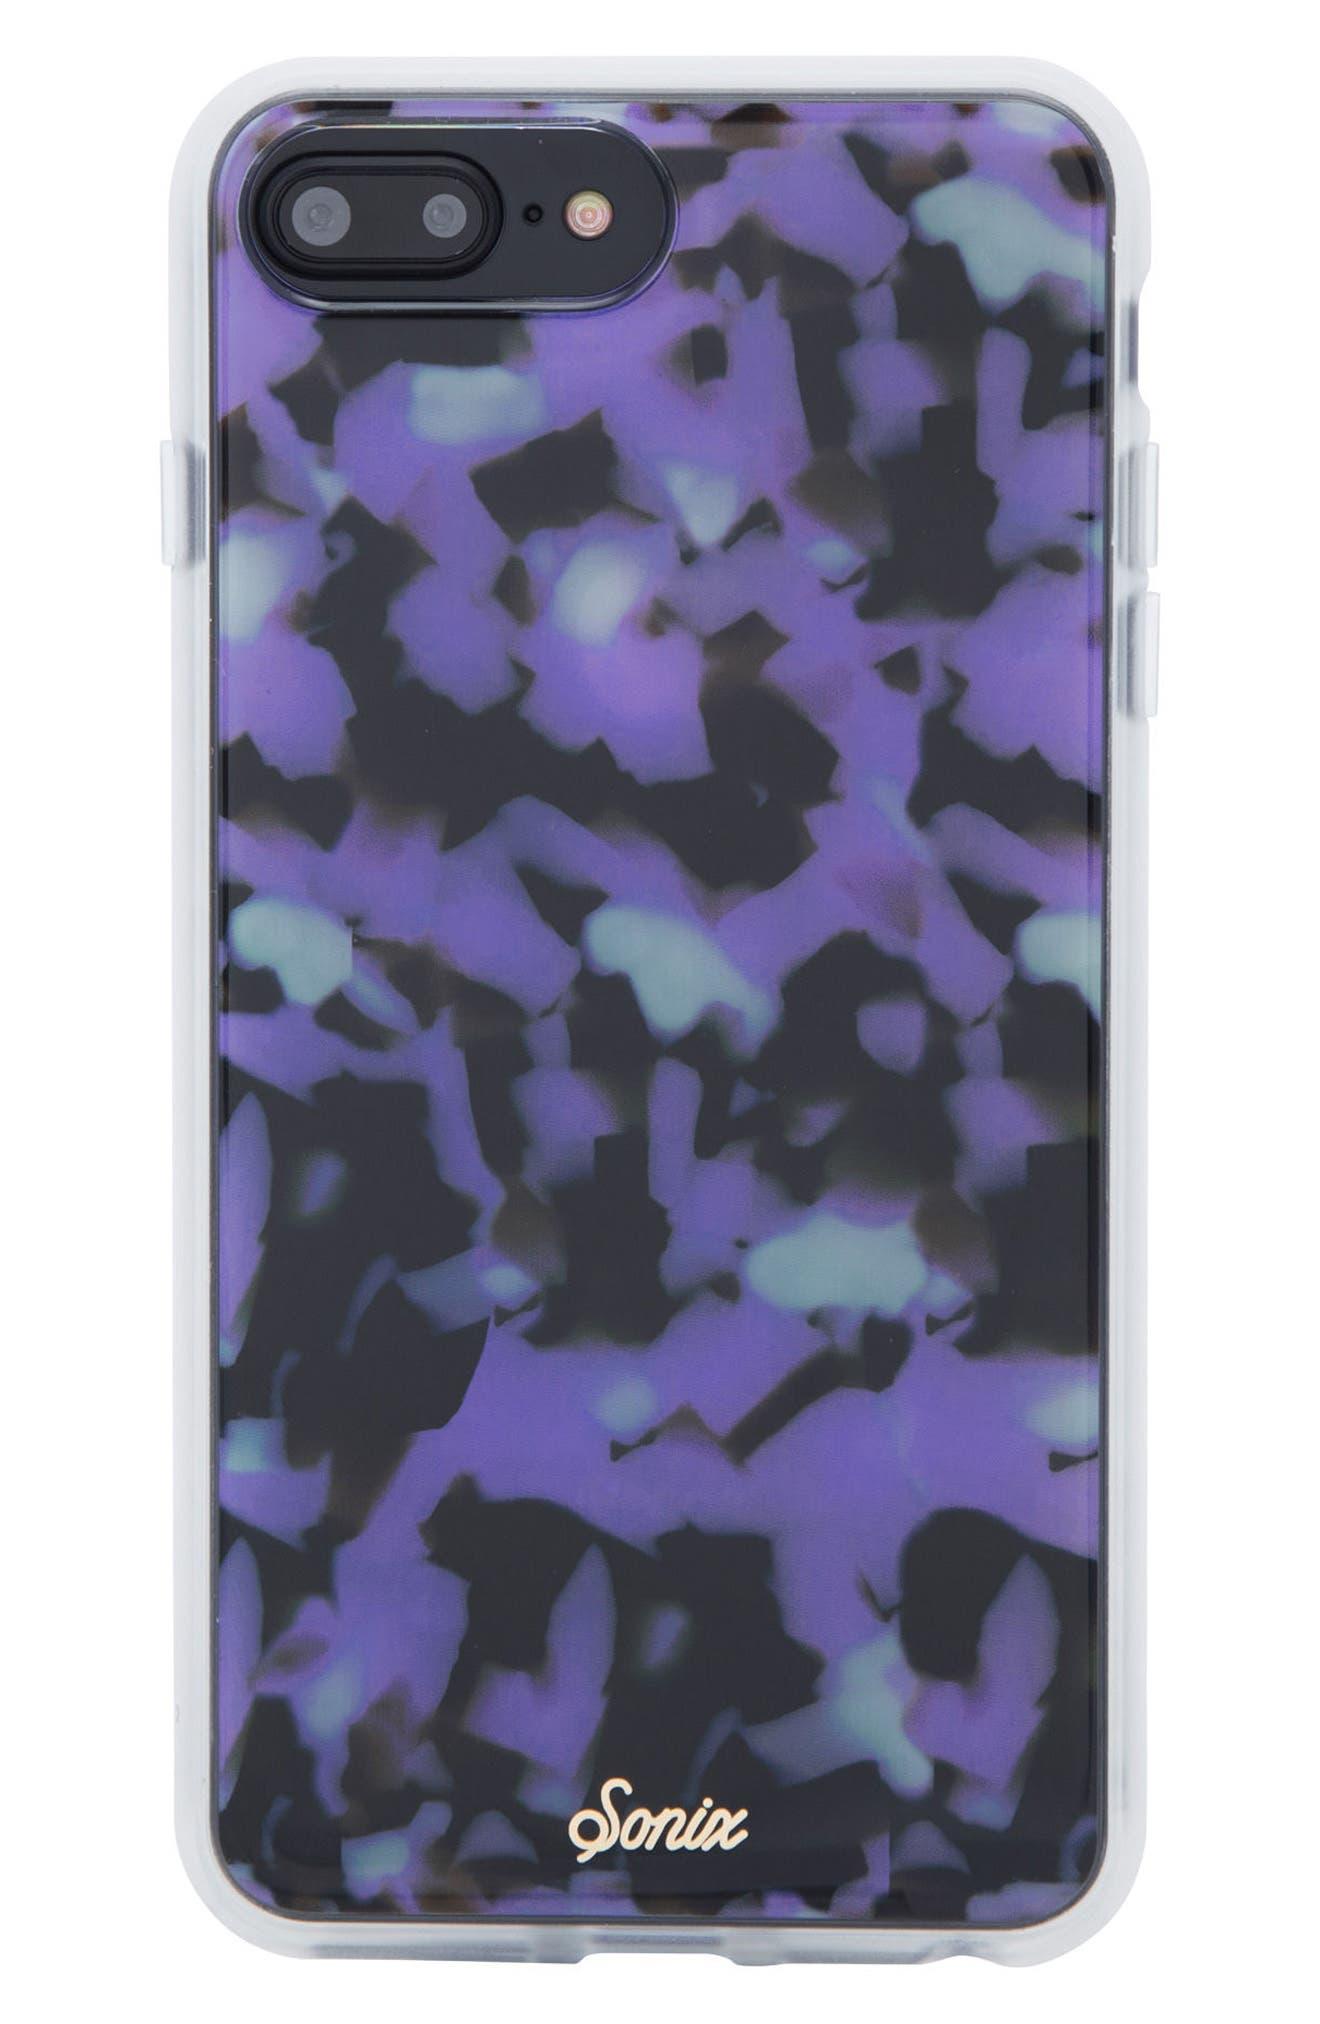 Sonic Terrazzo Lilac iPhone 6/6s/7/8 & 6/6s/7/8 Plus Case,                         Main,                         color, Lilac